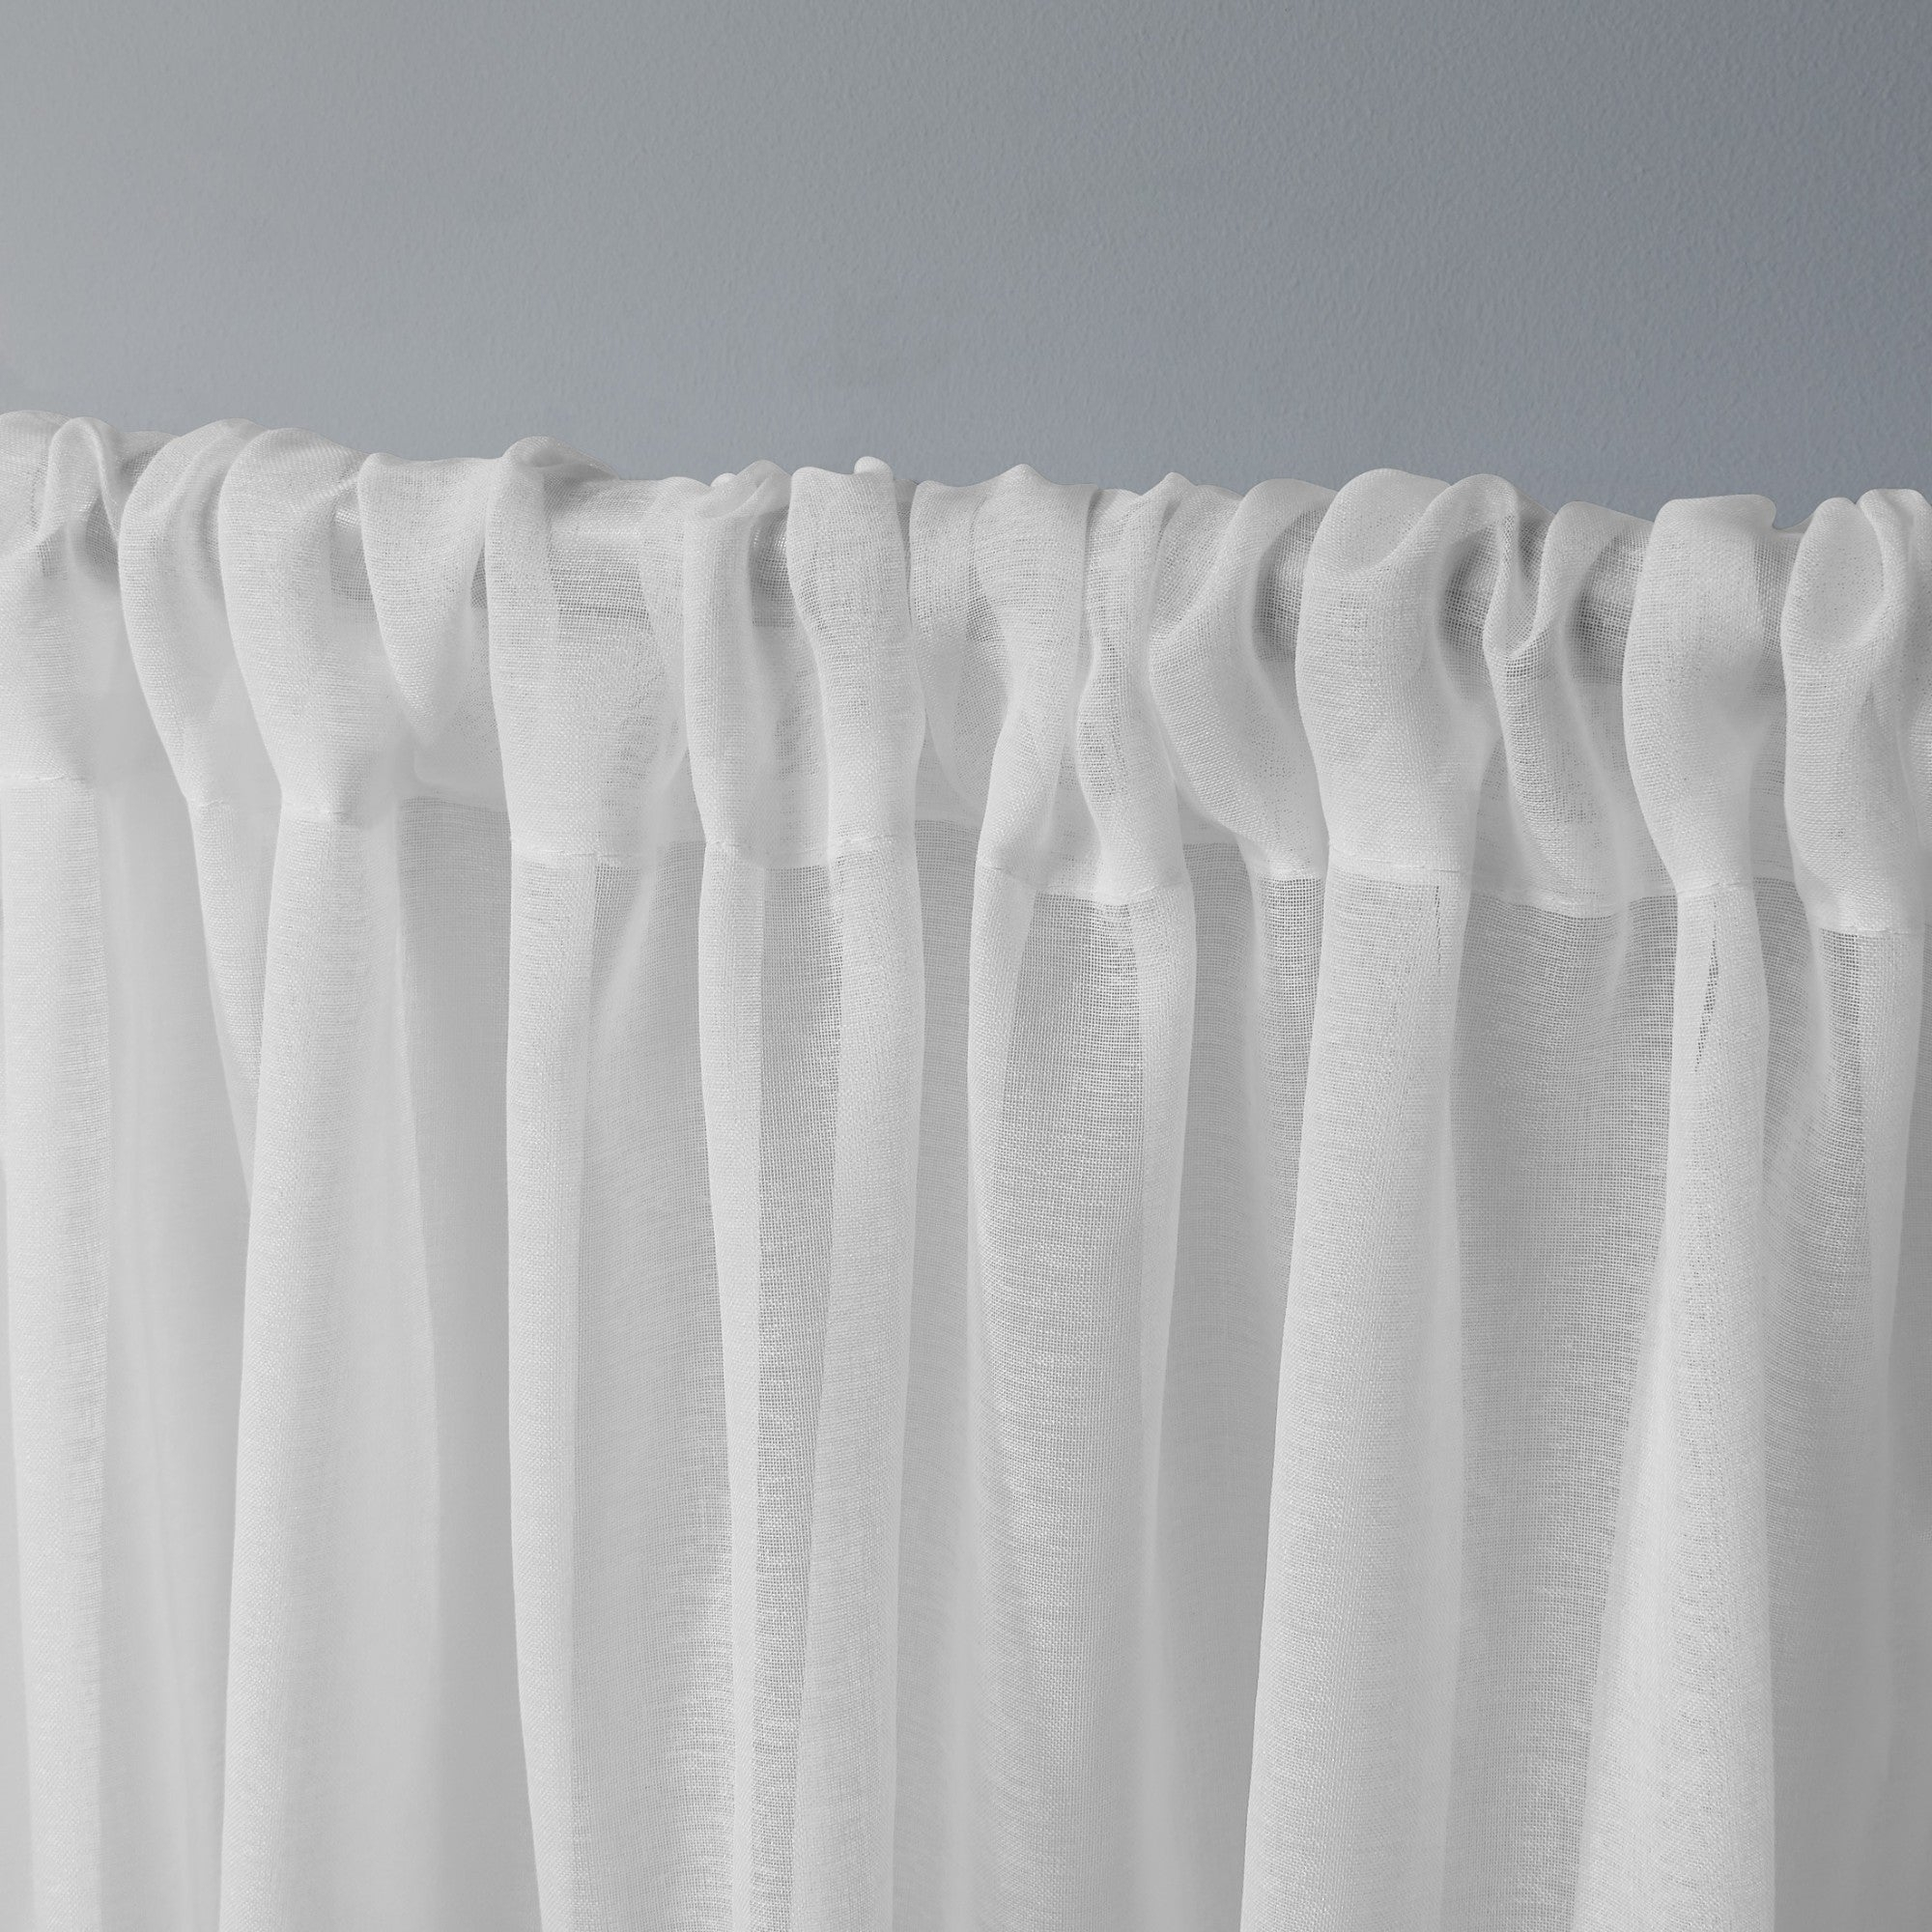 Ati Home Tassels Applique Sheer Rod Pocket Top Curtain Panel Pair Regarding Tassels Applique Sheer Rod Pocket Top Curtain Panel Pairs (View 3 of 30)